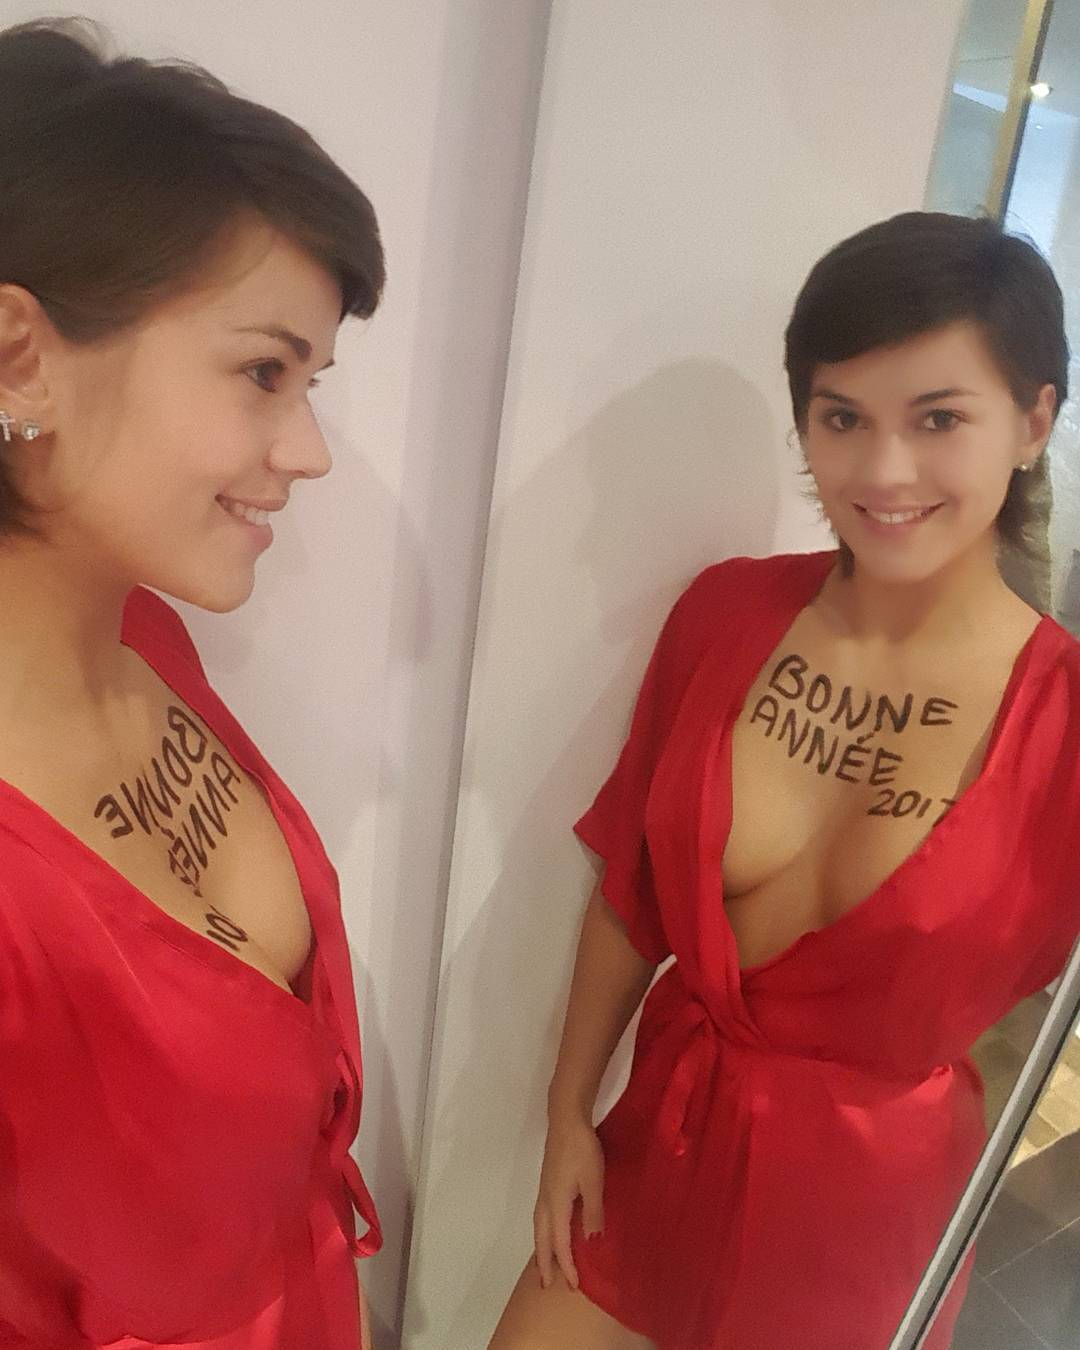 Victoria Alouquas Hot Selfies Pt.2 (NSFW) - BootymotionTV